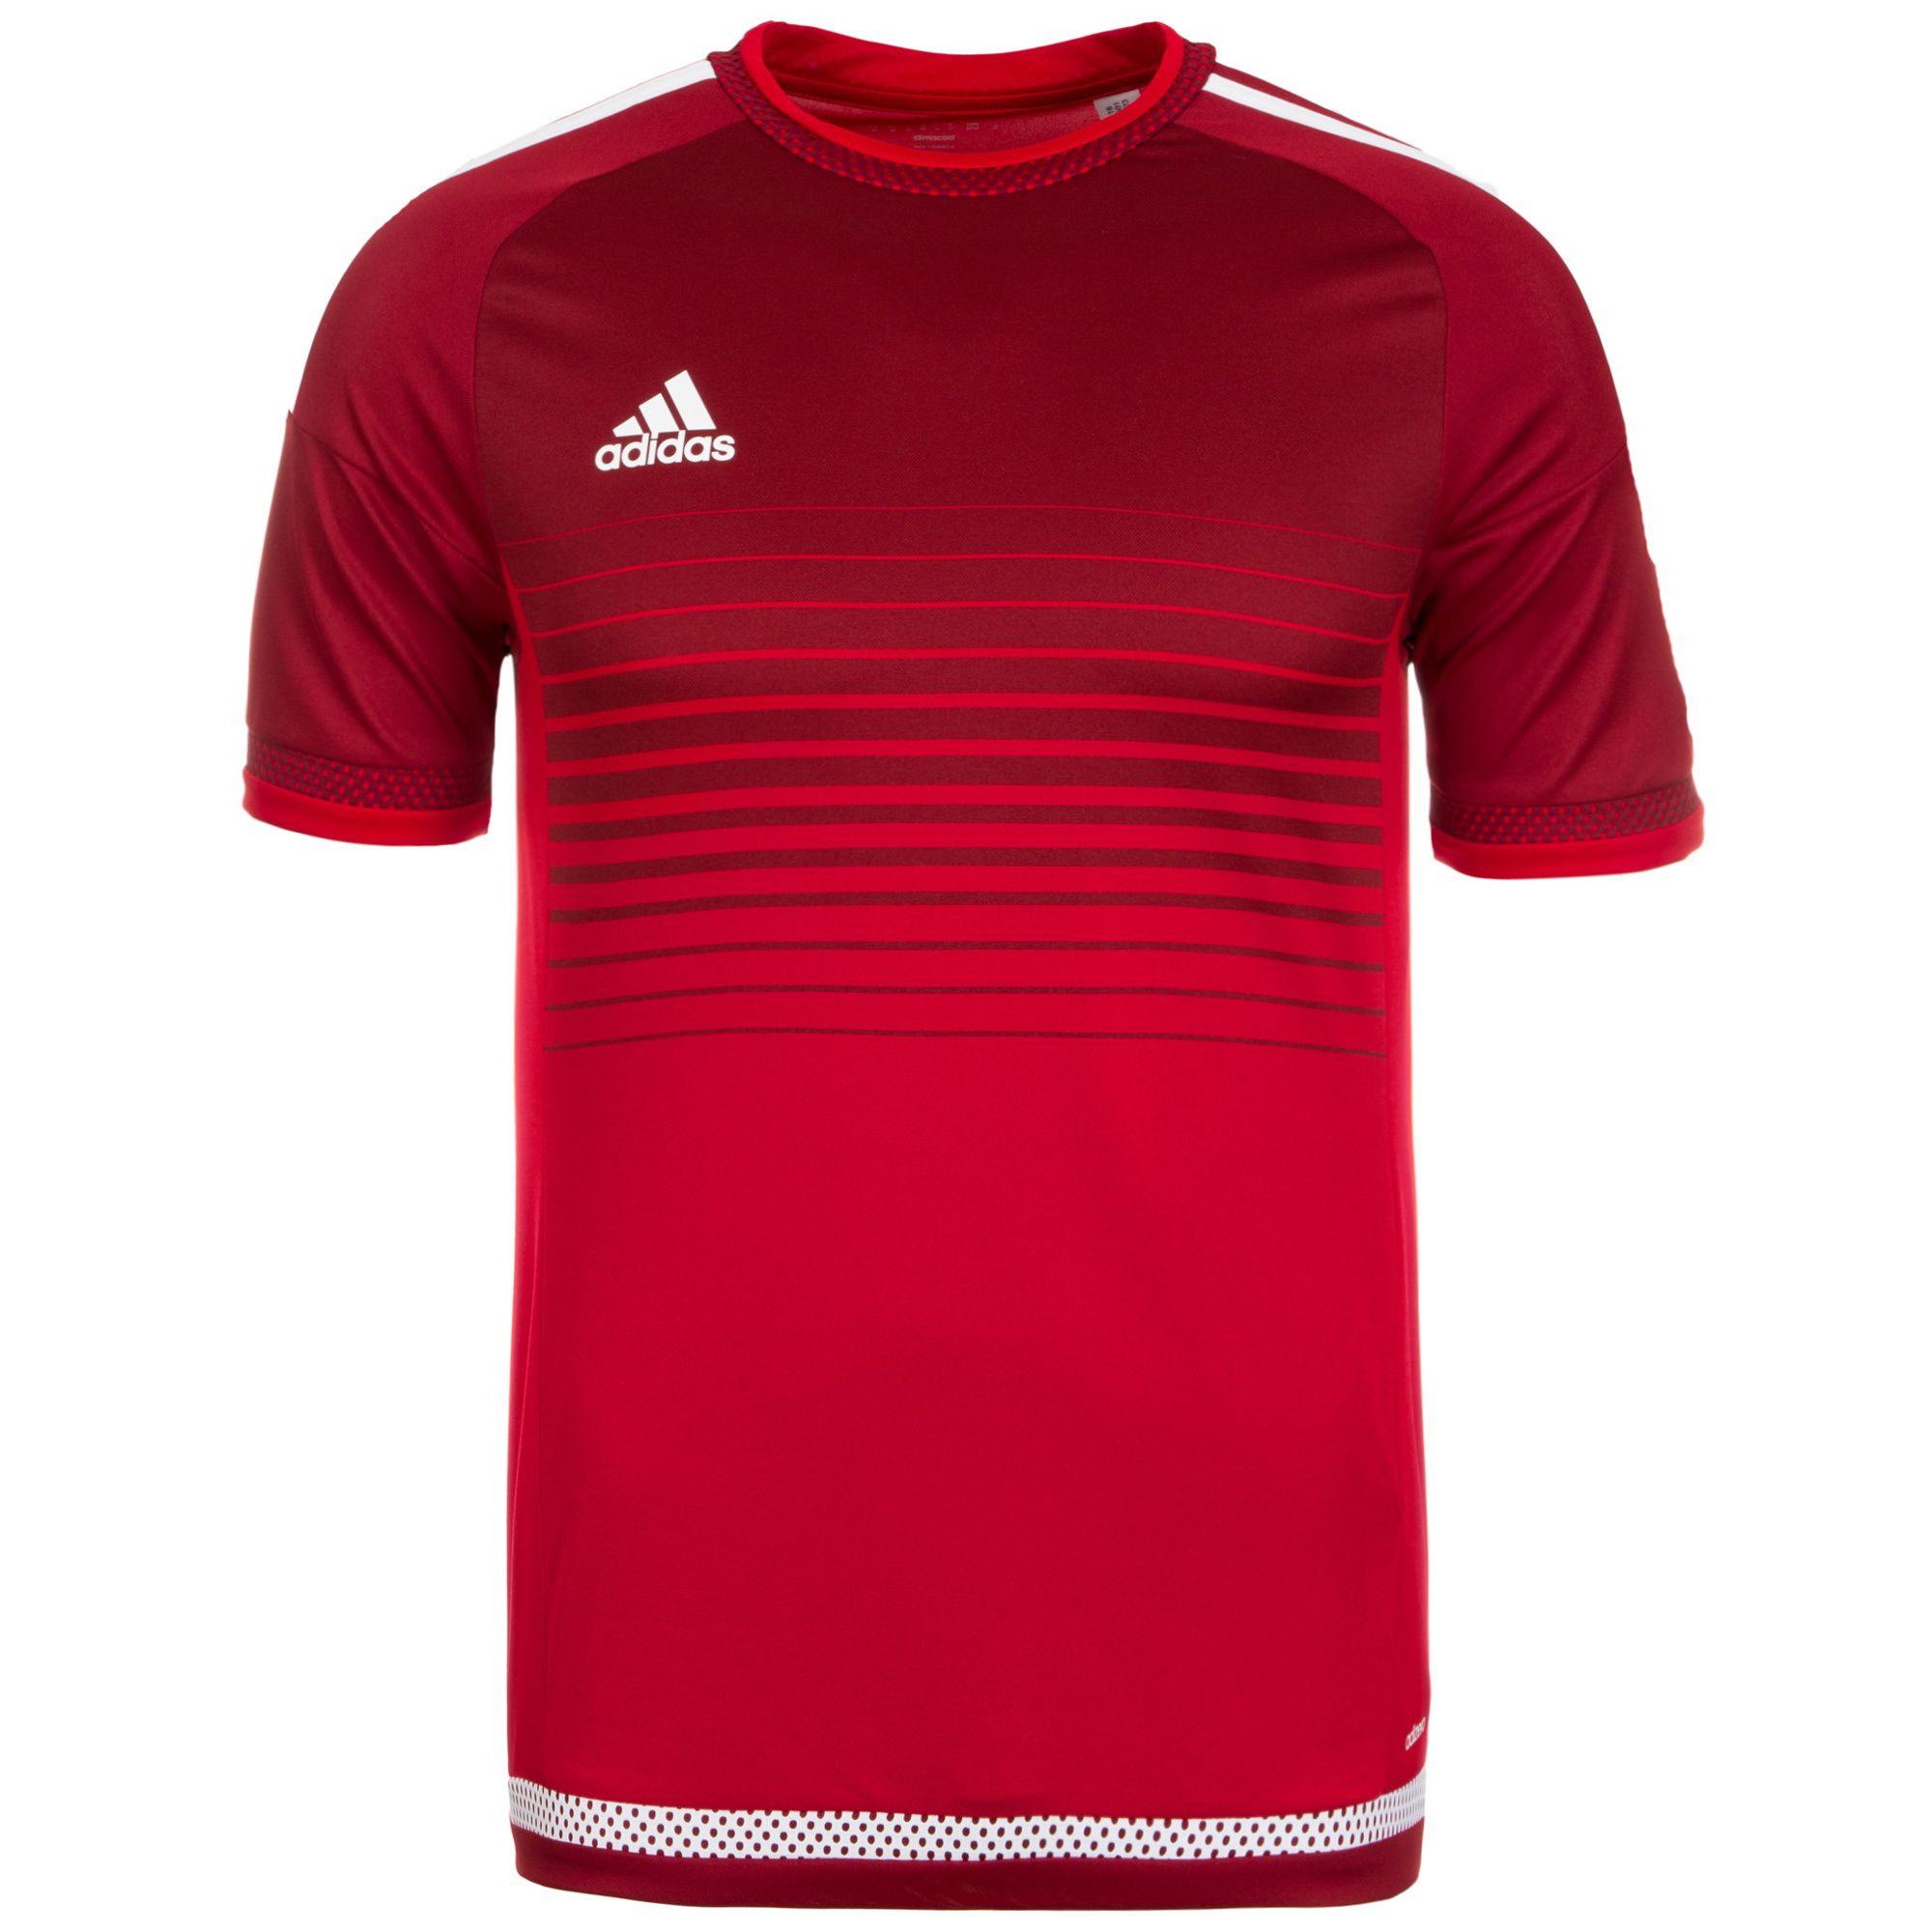 ADIDAS PERFORMANCE adidas Performance Campeon 15 Fußballtrikot Herren